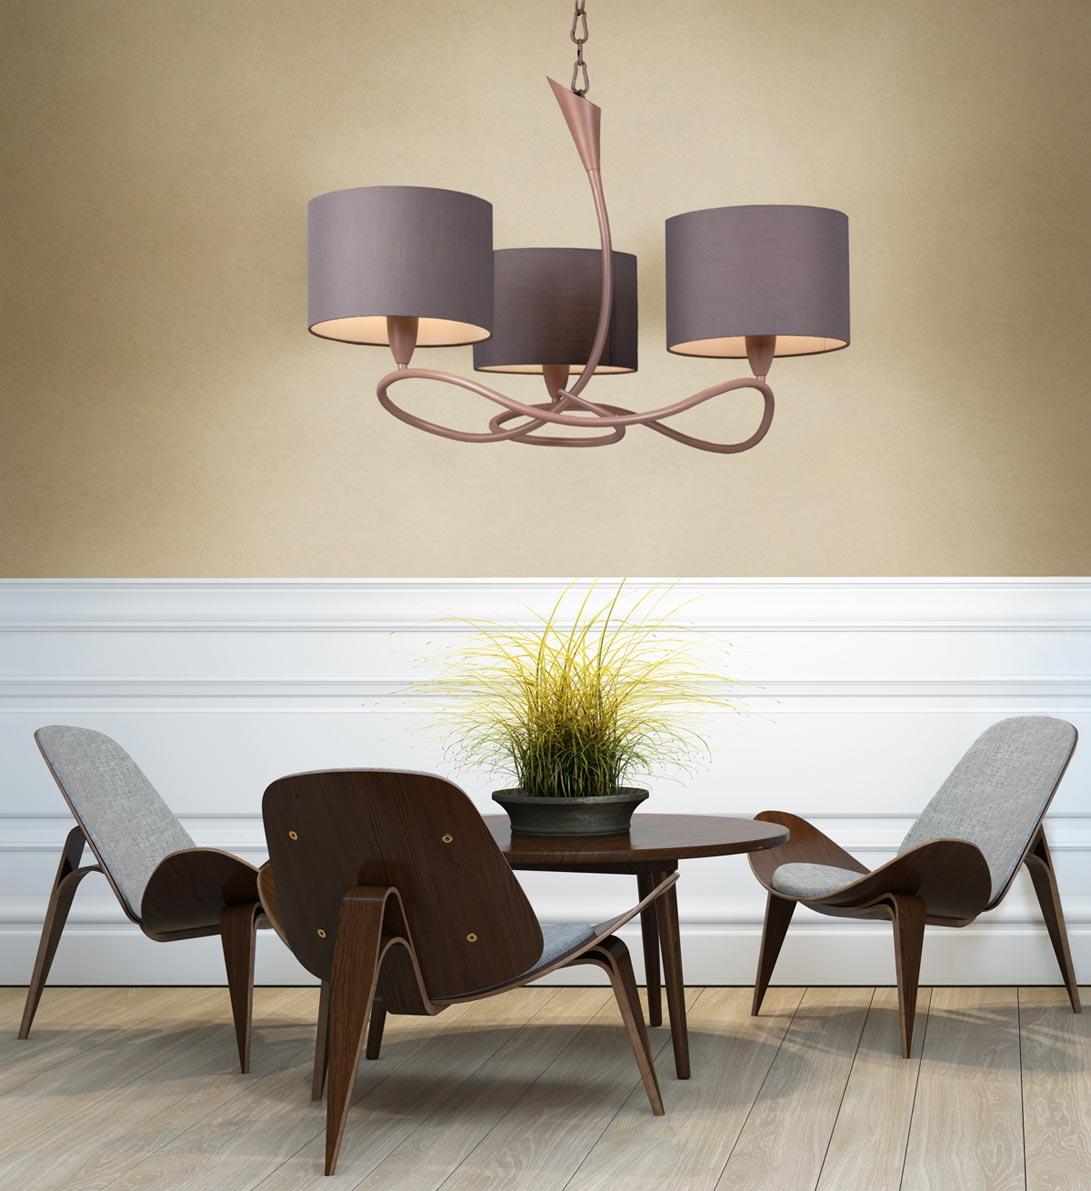 Lámpara colgante LUA gris/ceniza 3 luces ambiente